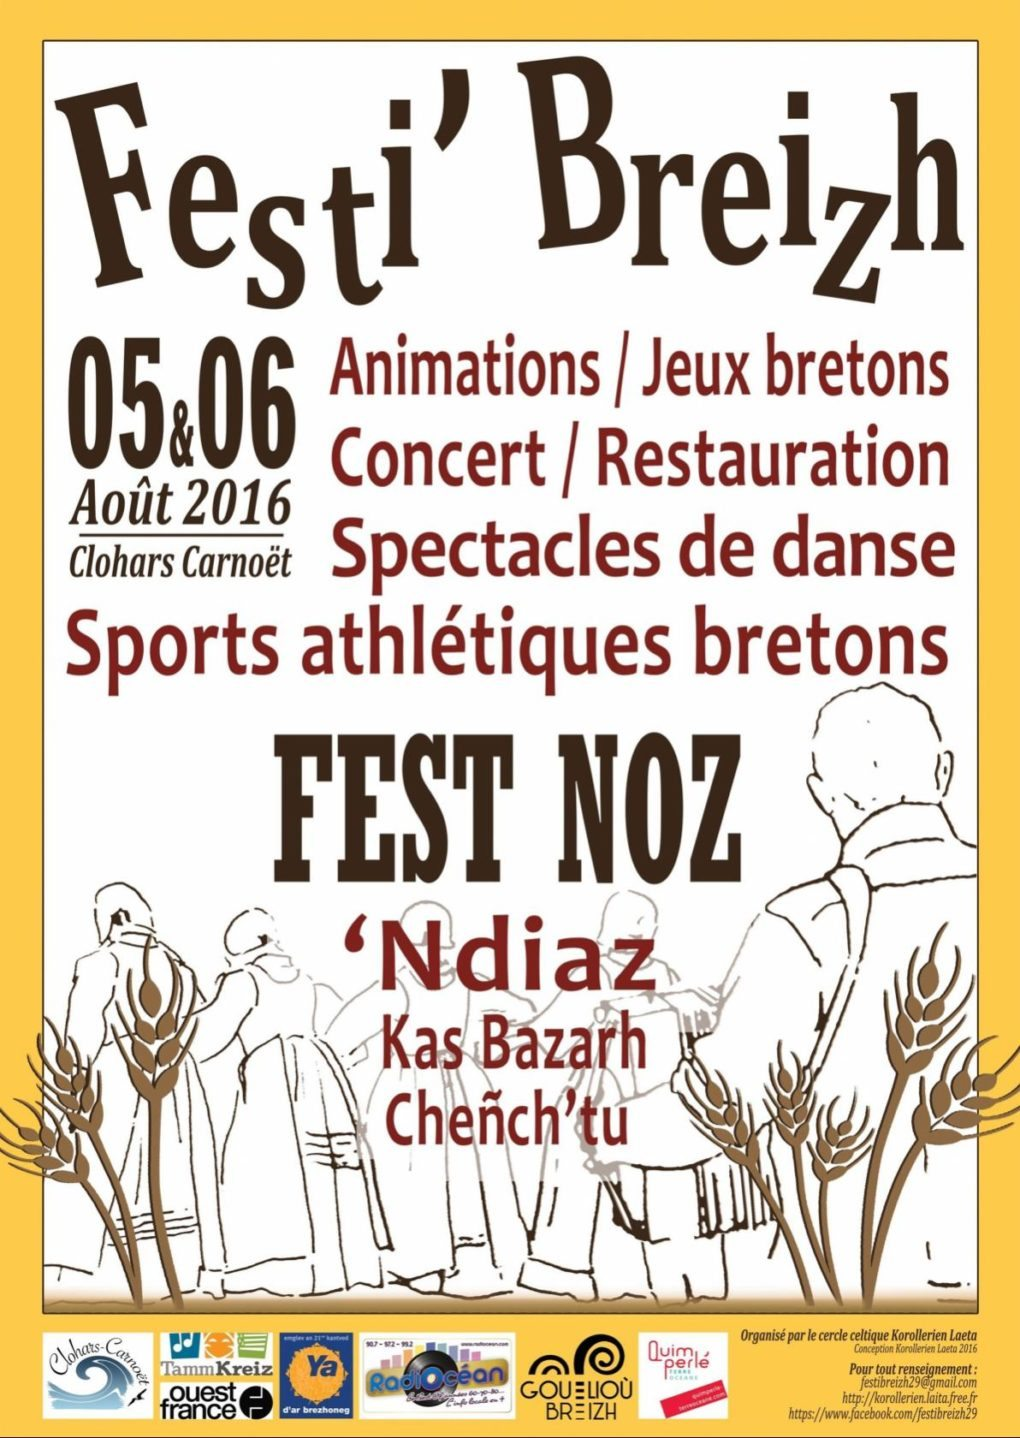 Festi'Breizh Clohars-Carnoët